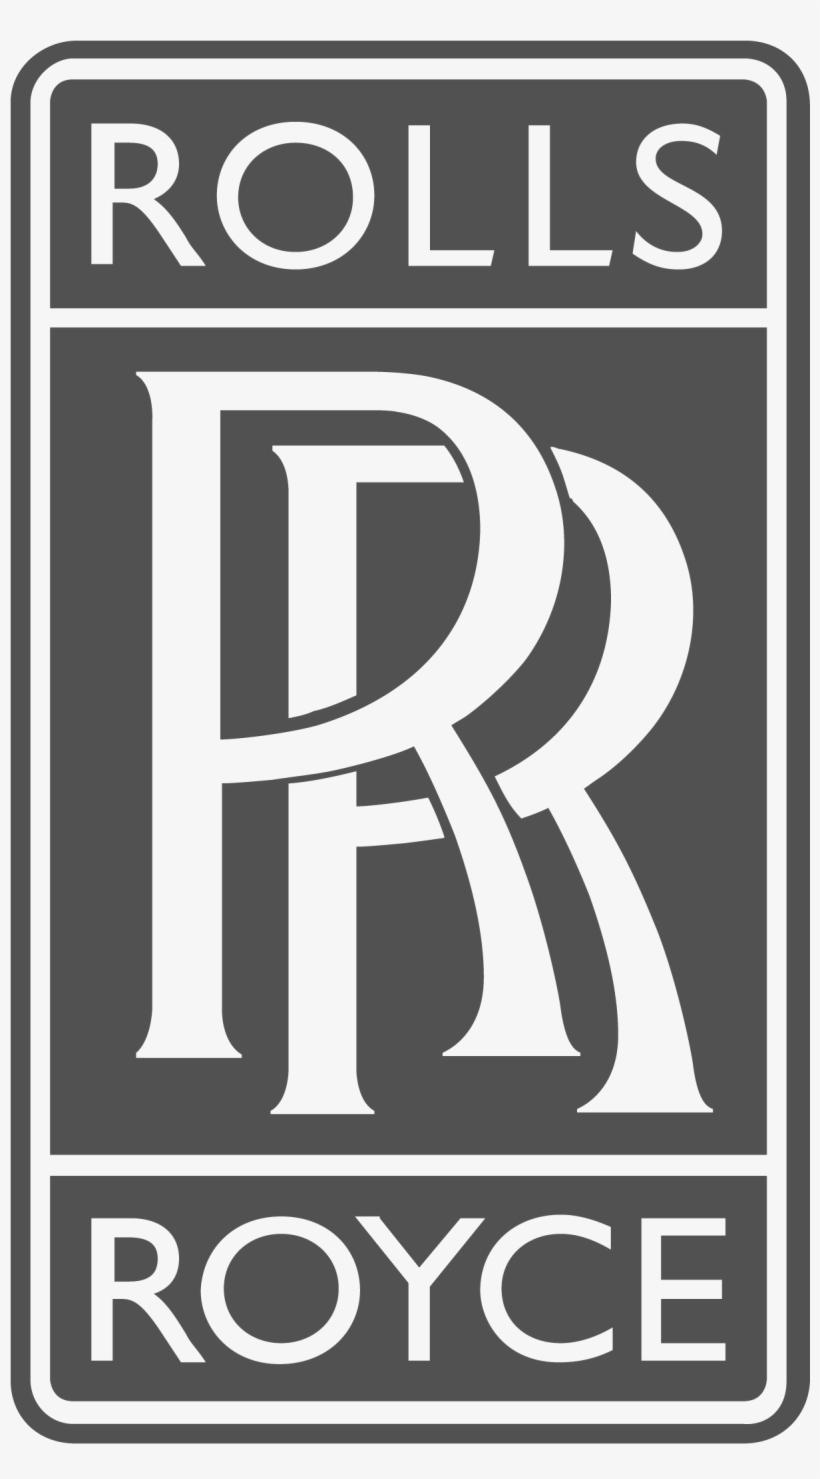 Rolls Royce Emblem White Rolls Royce Logo Transparent Png 3840x2160 Free Download On Nicepng